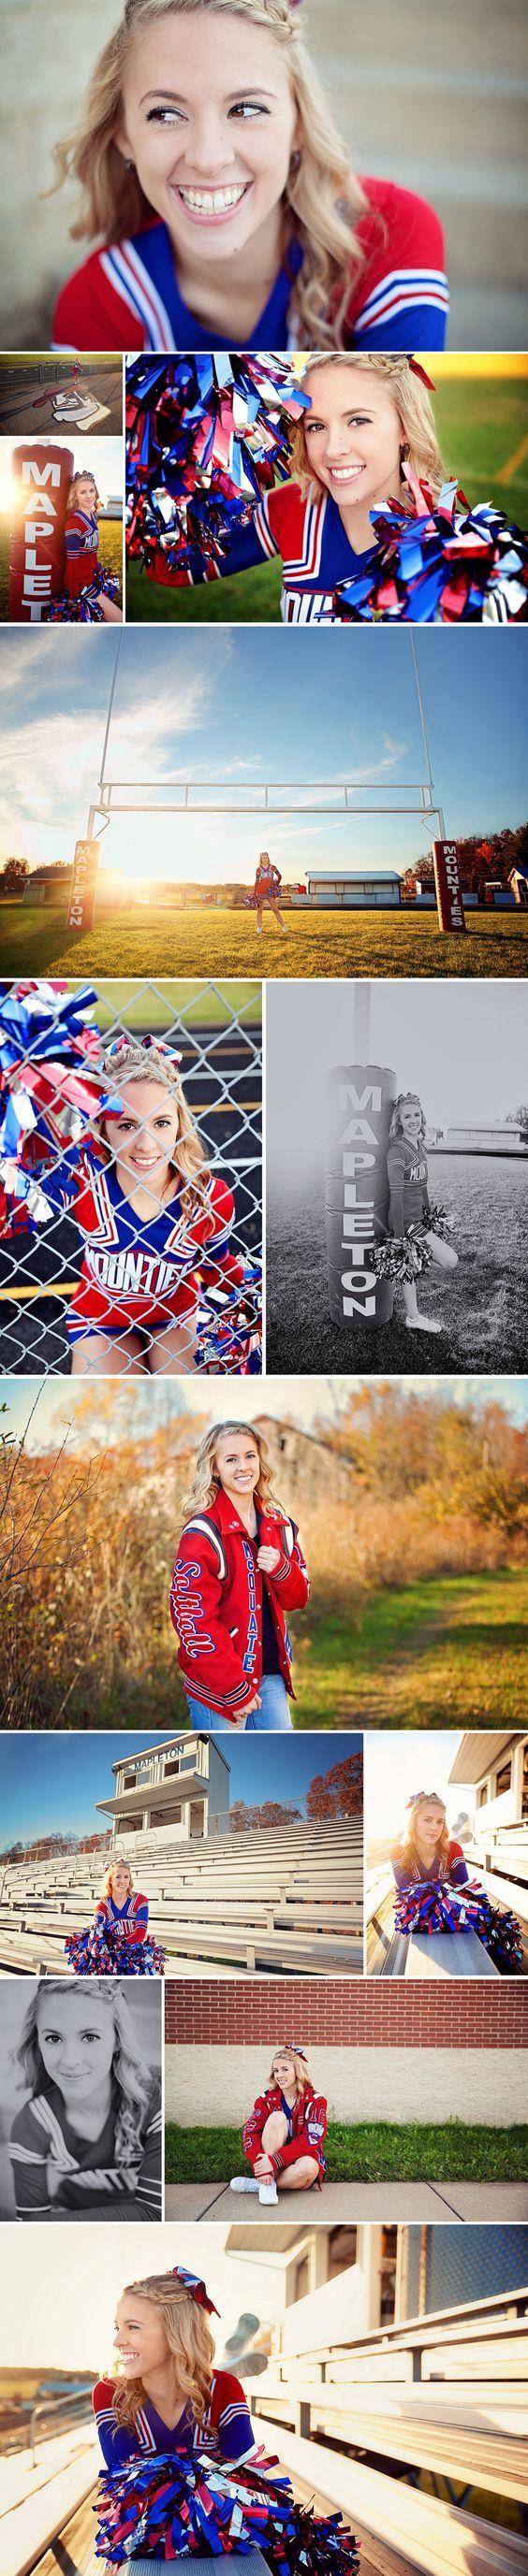 Cheerleading Senior Photo Ideas - Ashland Ohio Senior Photography - The Picture Show